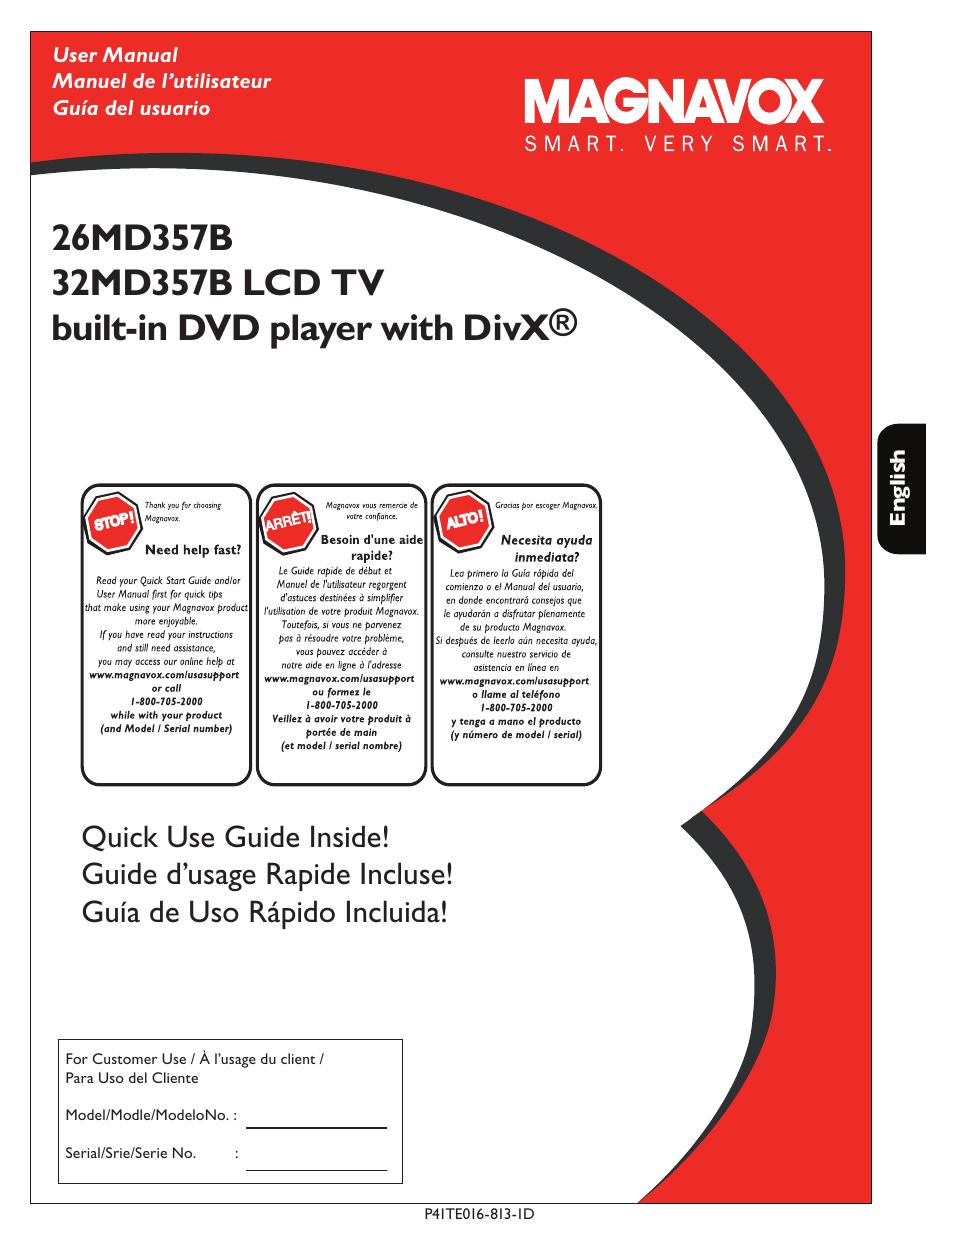 philips magnavox 26md357b user manual 56 pages rh manualsdir com Magnavox Flat Screen TV Manual Magnavox LCD TV Manual